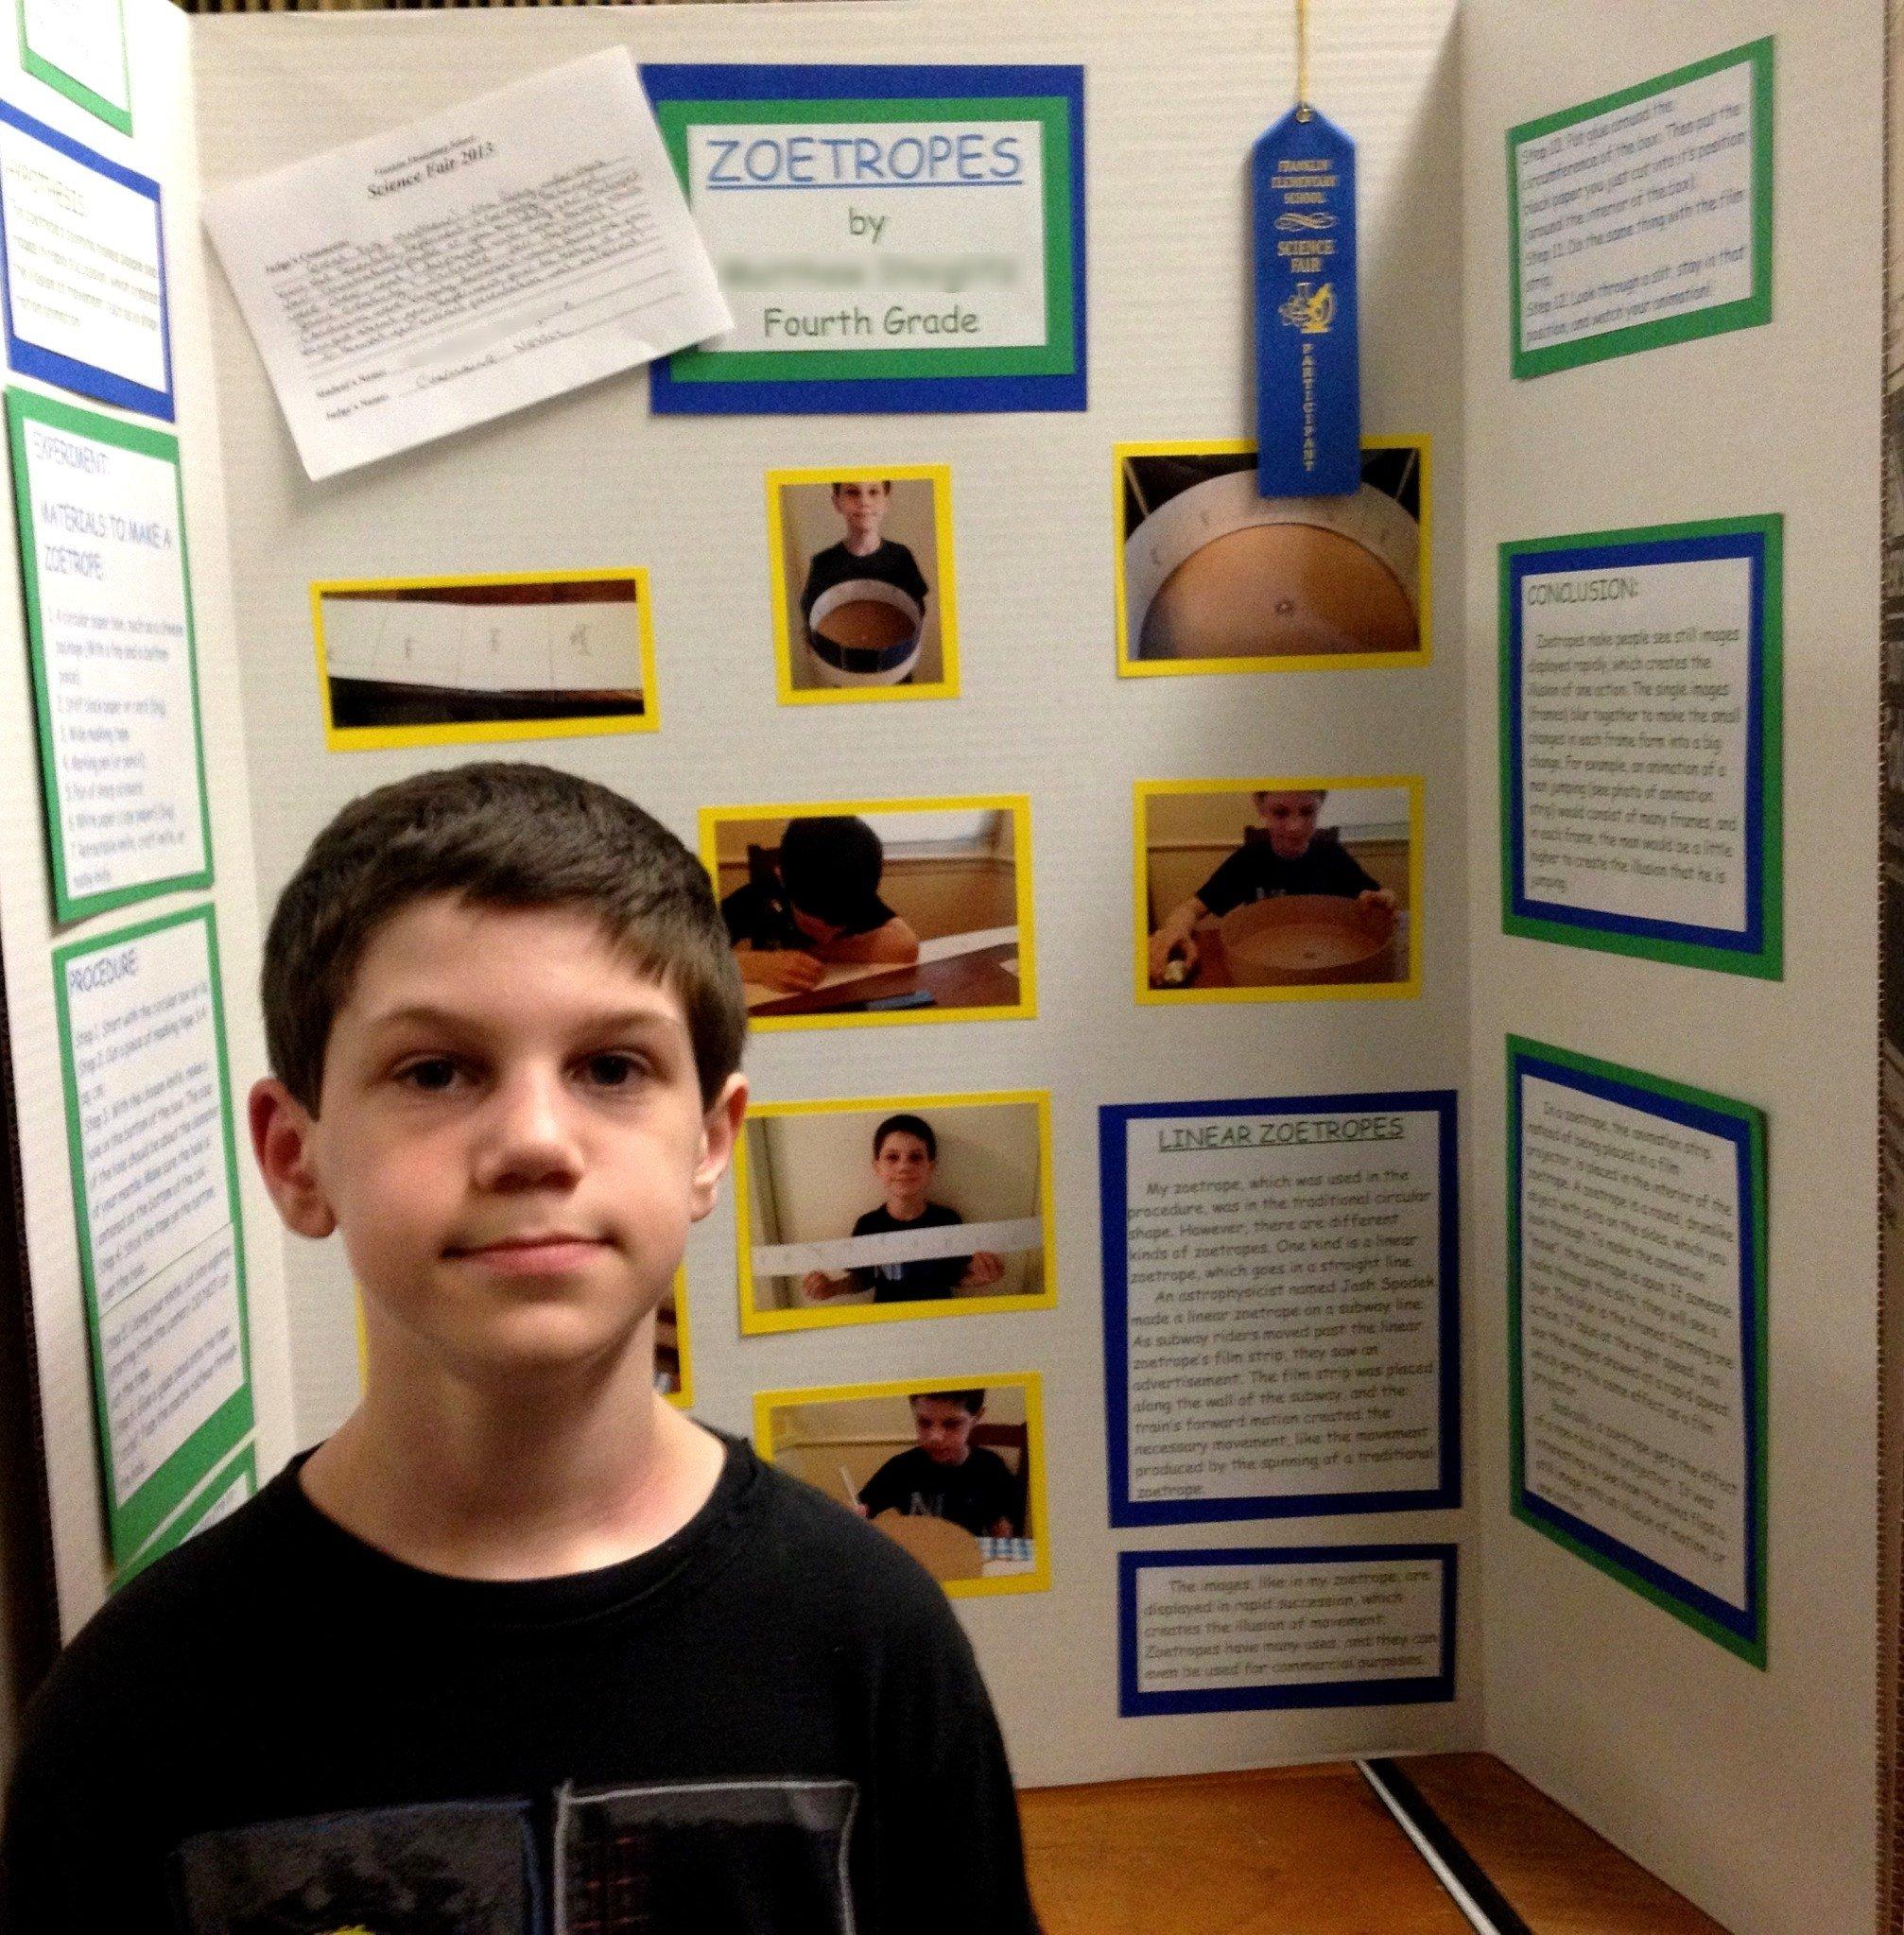 10 Great Science Fair Ideas 4Th Grade zoetropes in a fourth grade science fair joshua spodek 1